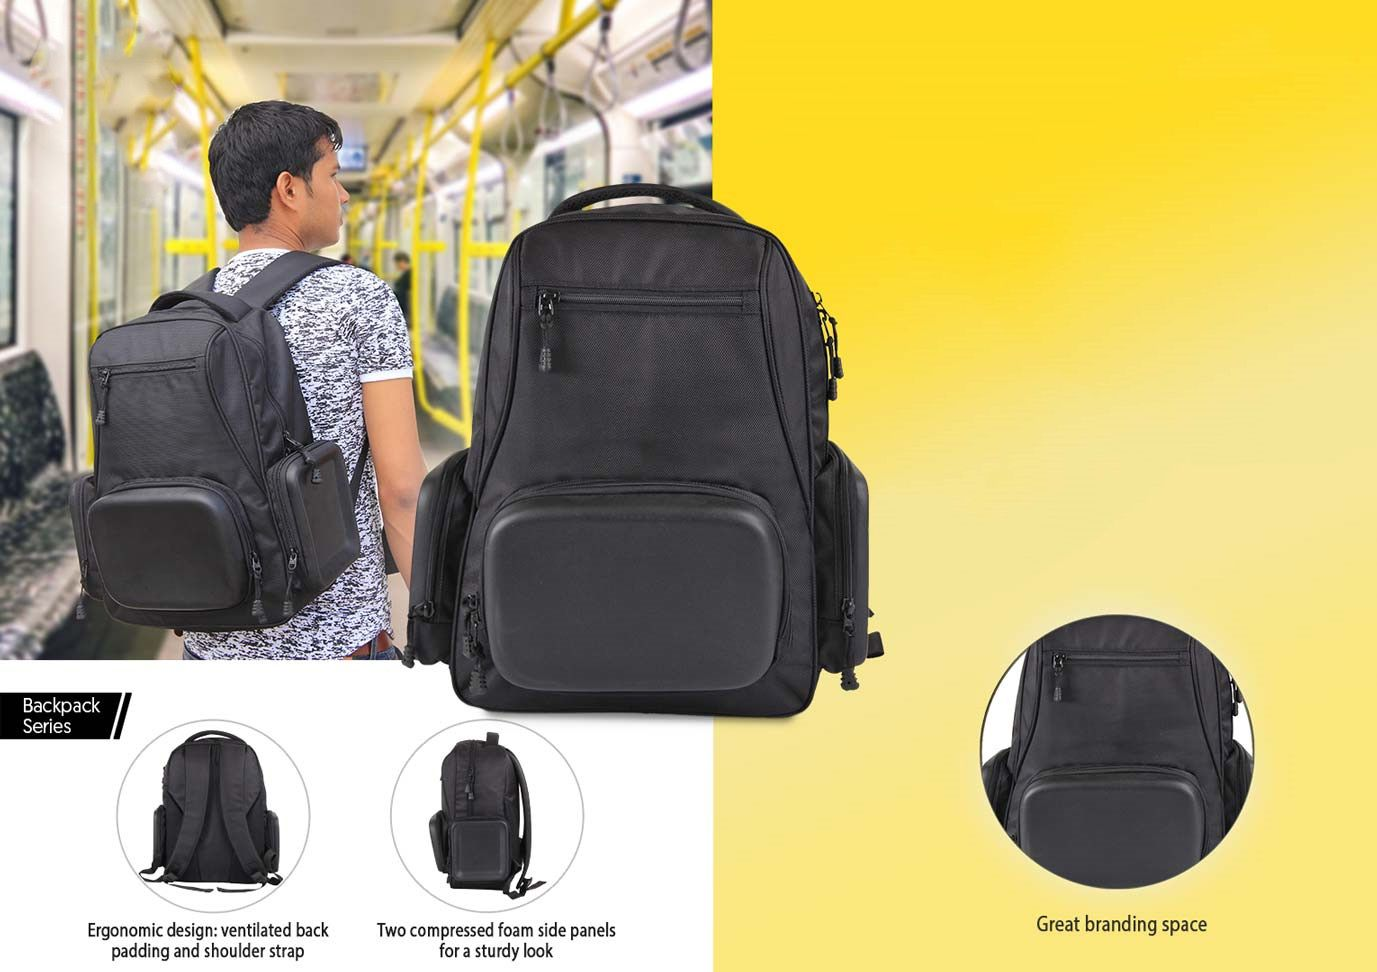 Power Plus Tuff Stuff Backpack (3 Shell Pockets) By Castillo Milano S04 Black